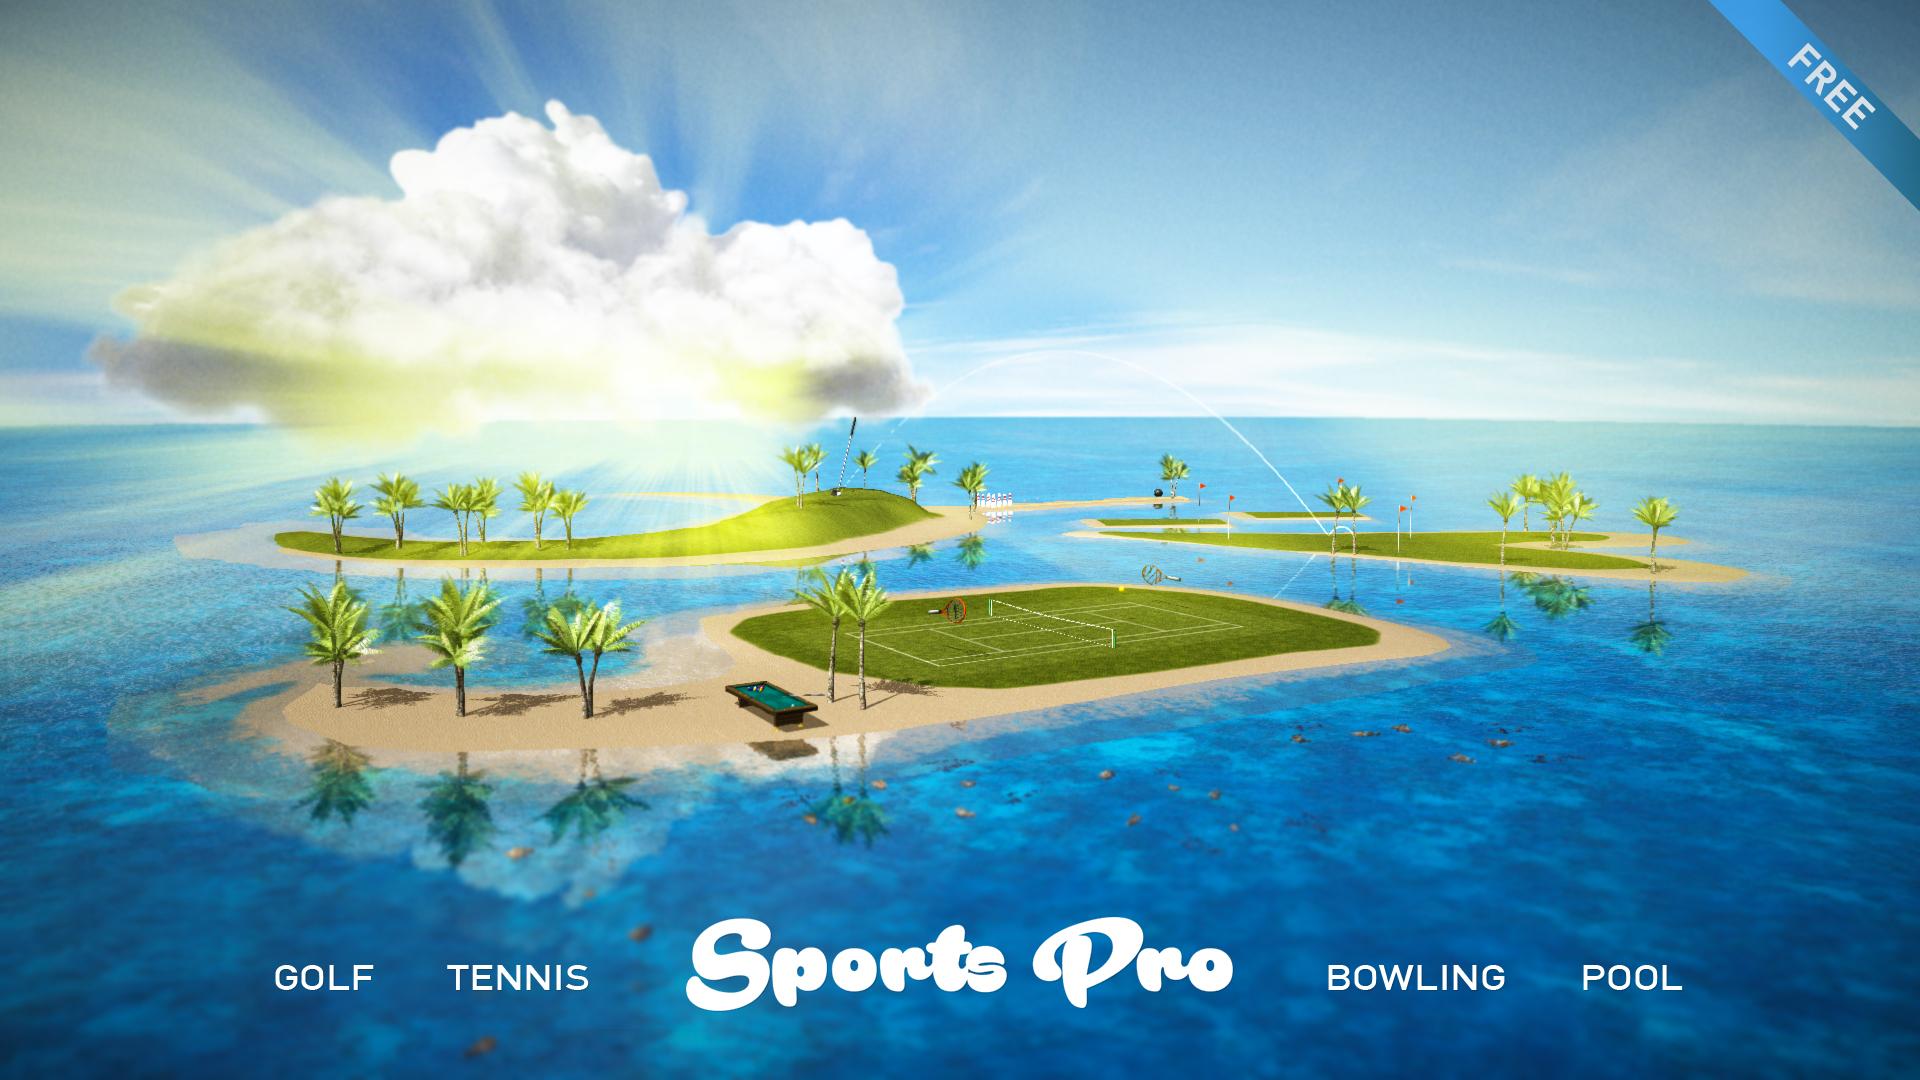 Sports Pro - Golf Tennis Bowling Pool screenshot 1